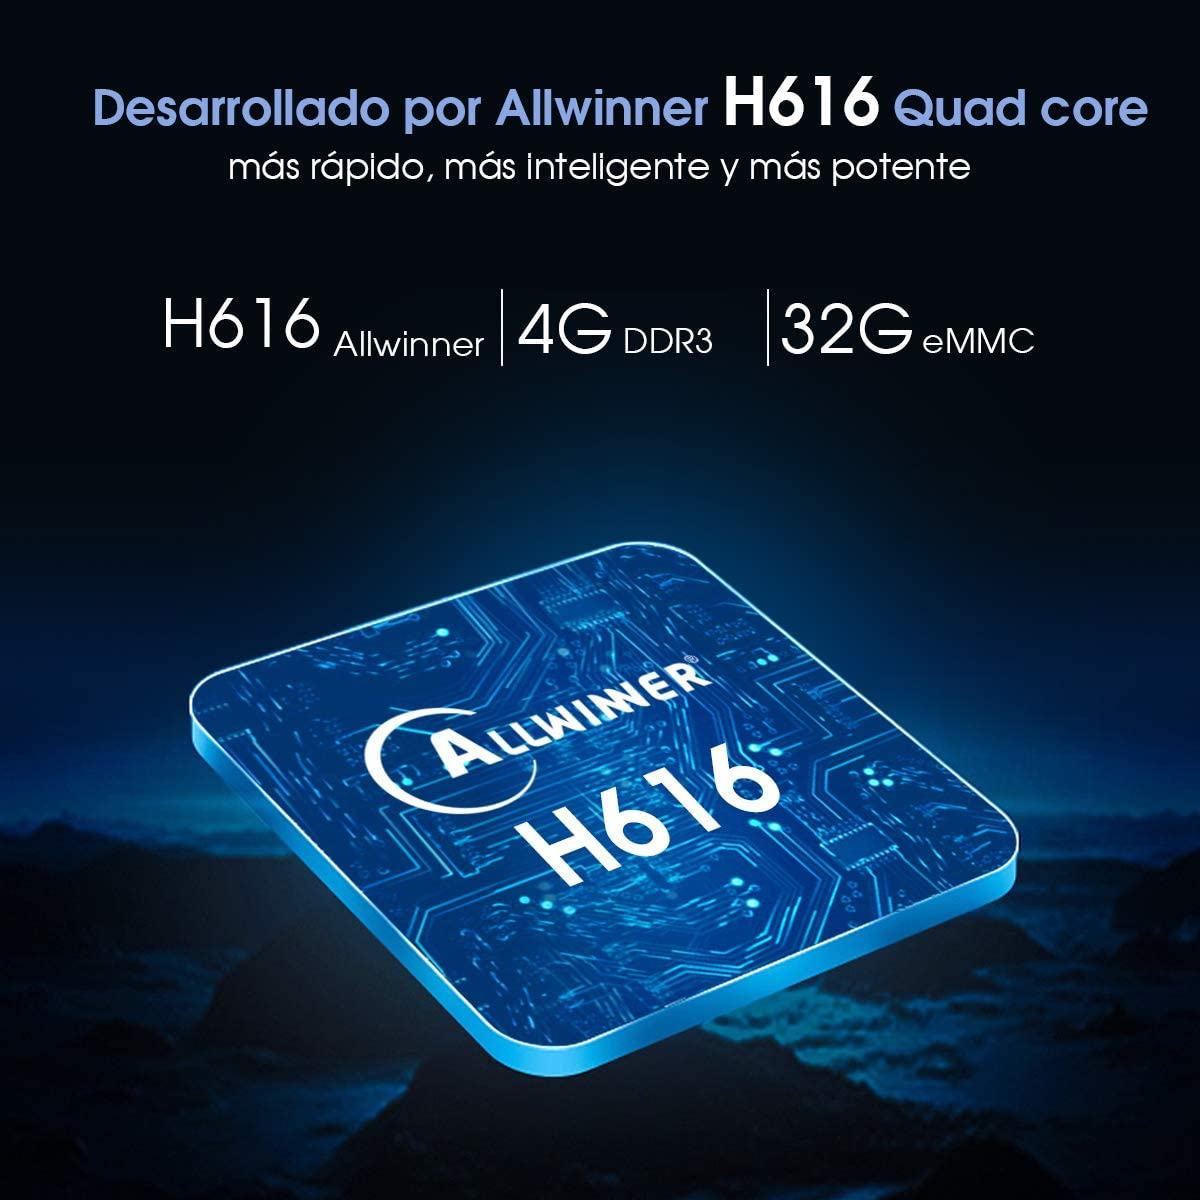 USB 3.0 Ultra HD 6K H.265 Android TV Box 2020 m/ás Nuevo X11 Pro TV Box Allwinner H616 Quad-Core 64bit con Dual-WiFi 2.4G // 5GHz BT 4.2 pendoo Android TV Box 10.0 4GB RAM 64GB ROM,